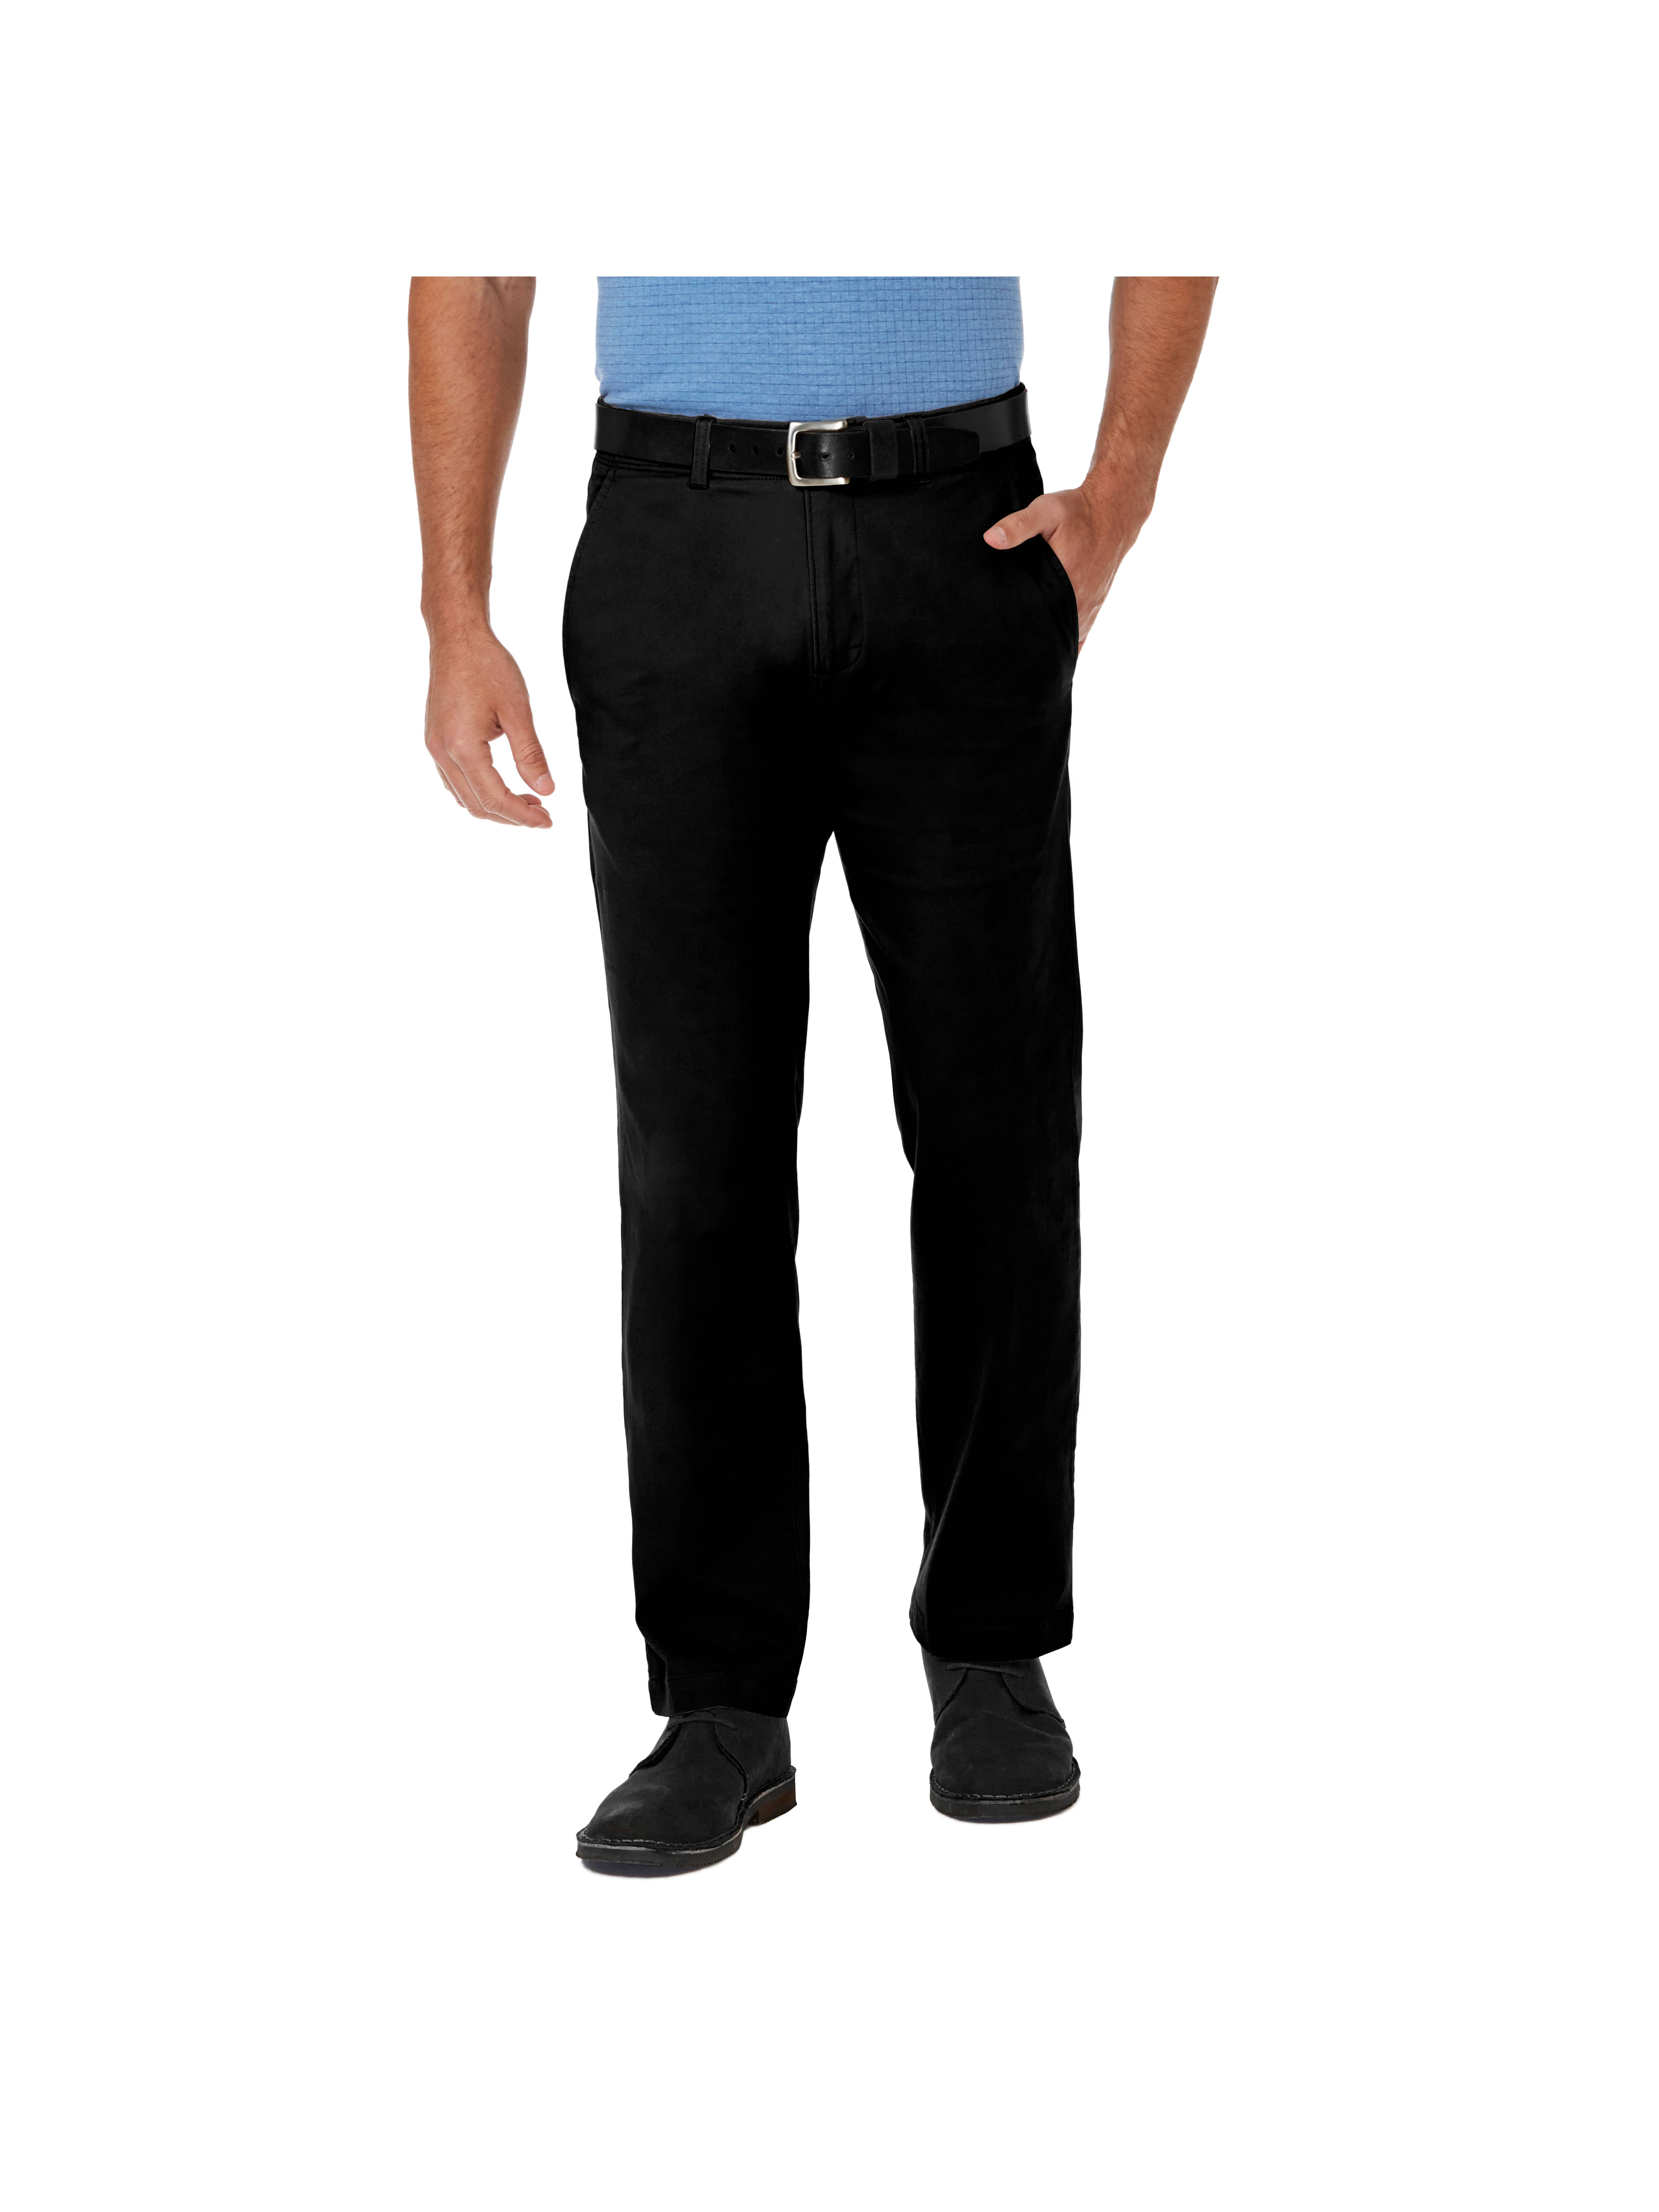 Men's Coastal Comfort Flat Front Chino Pant Straight Fit HC00274